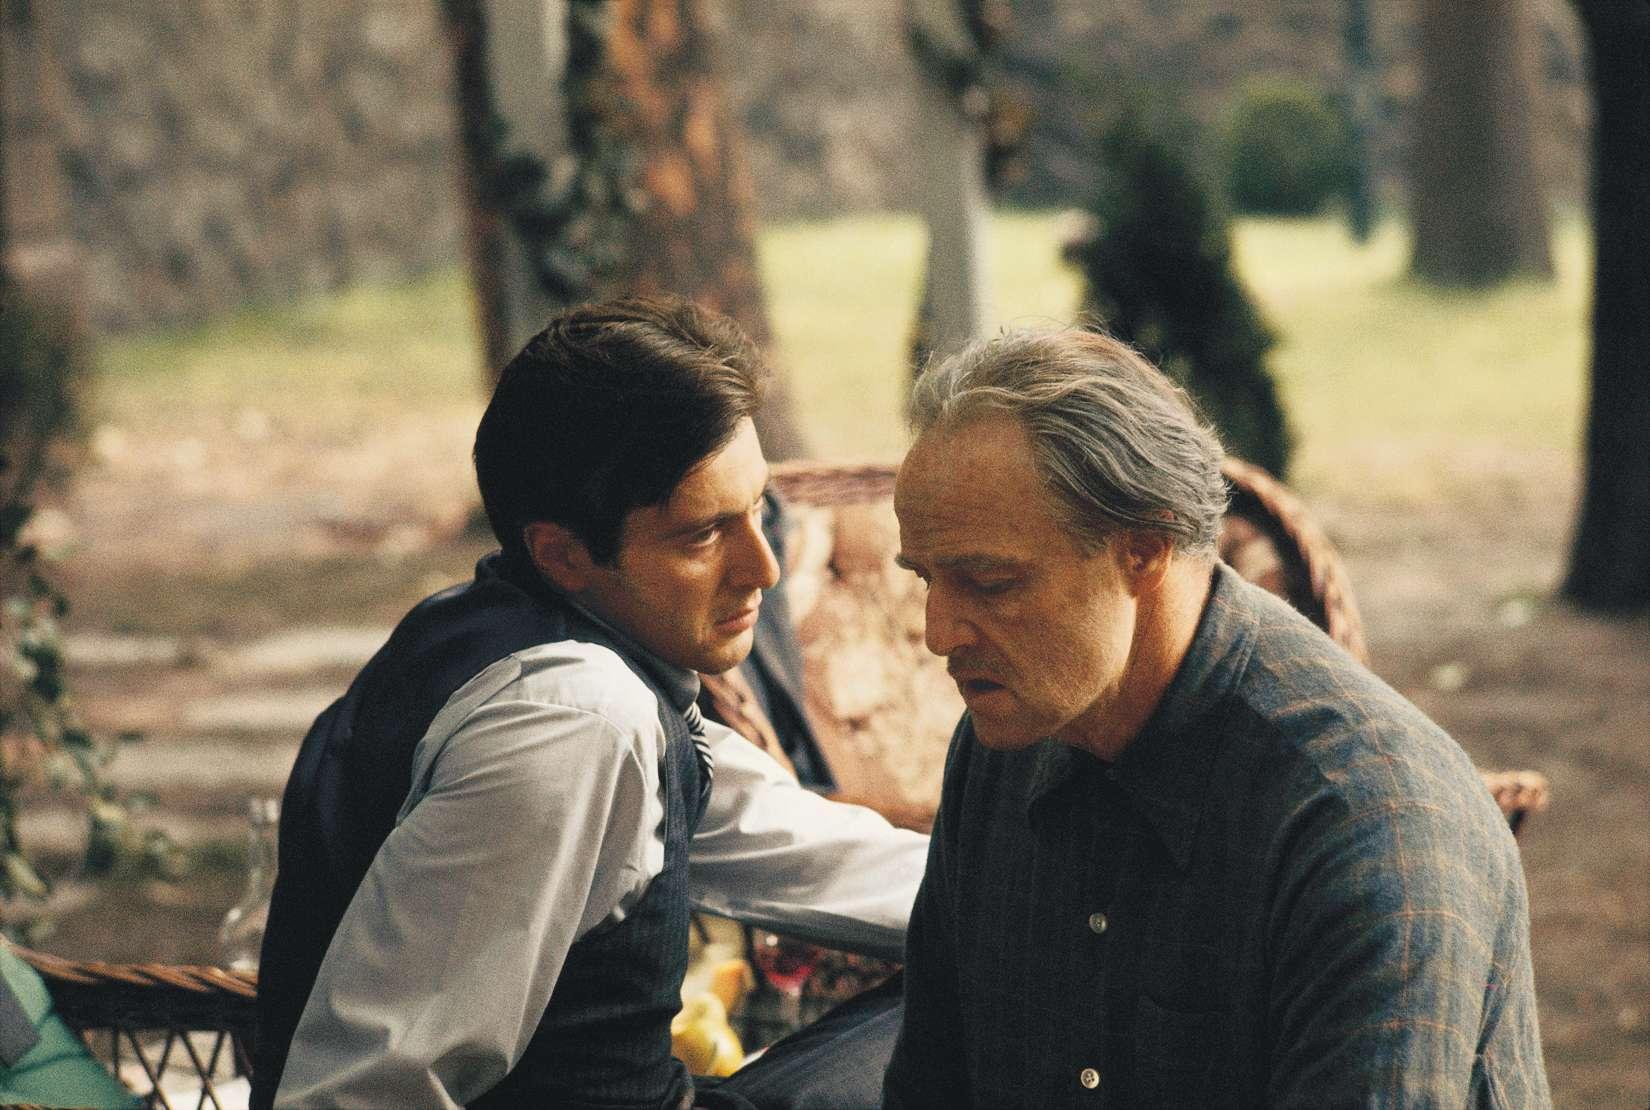 Steve Schapiro: The Godfather, Brando and Pacino in the Garden, Godfather  I, 1971 | Jackson Fine Art